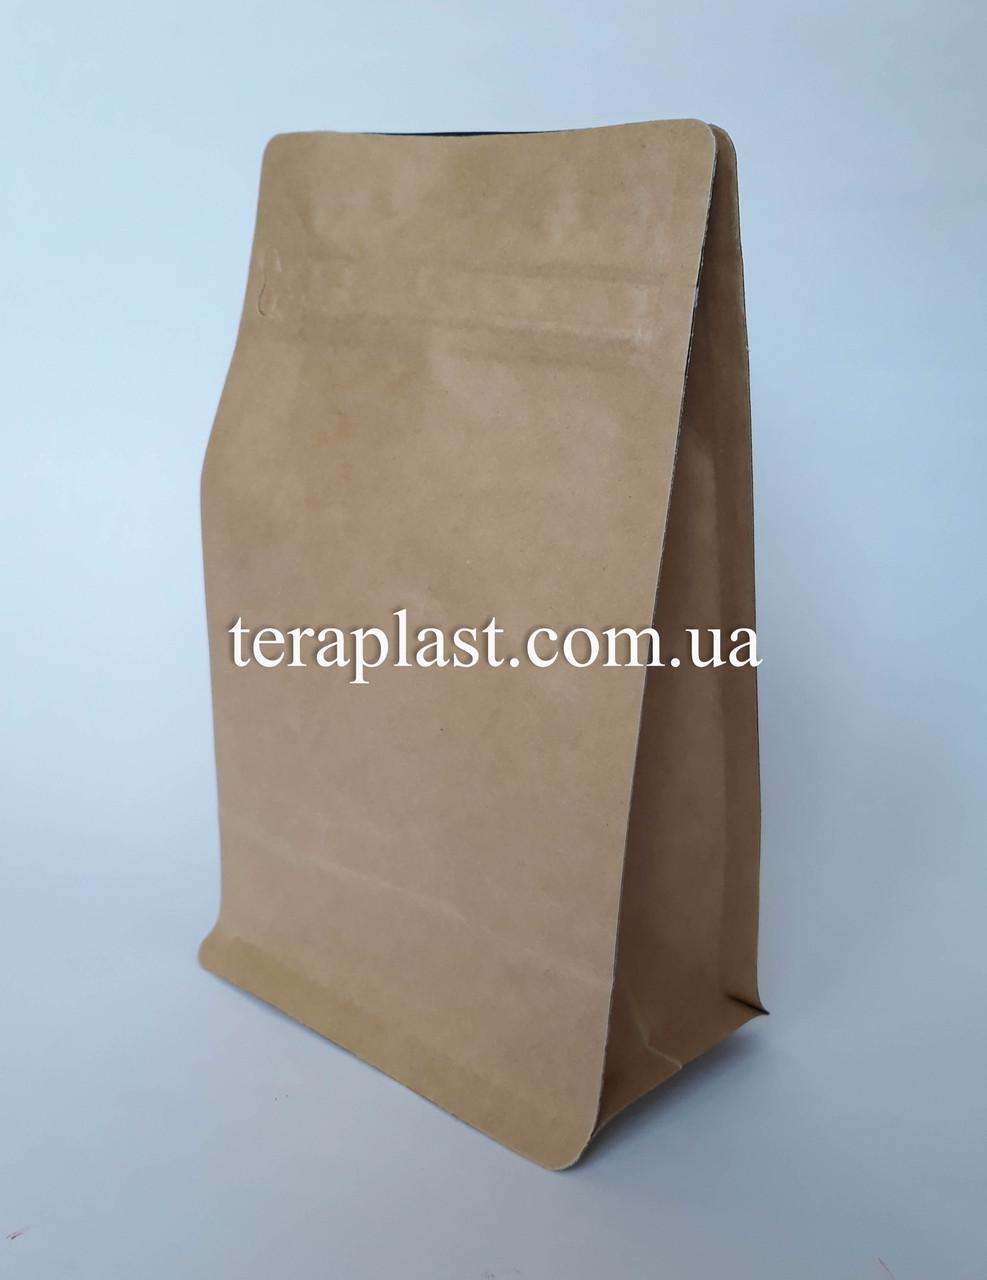 Пакет с плоским дном 1кг крафт+металл 145х90х340 с зип-замком